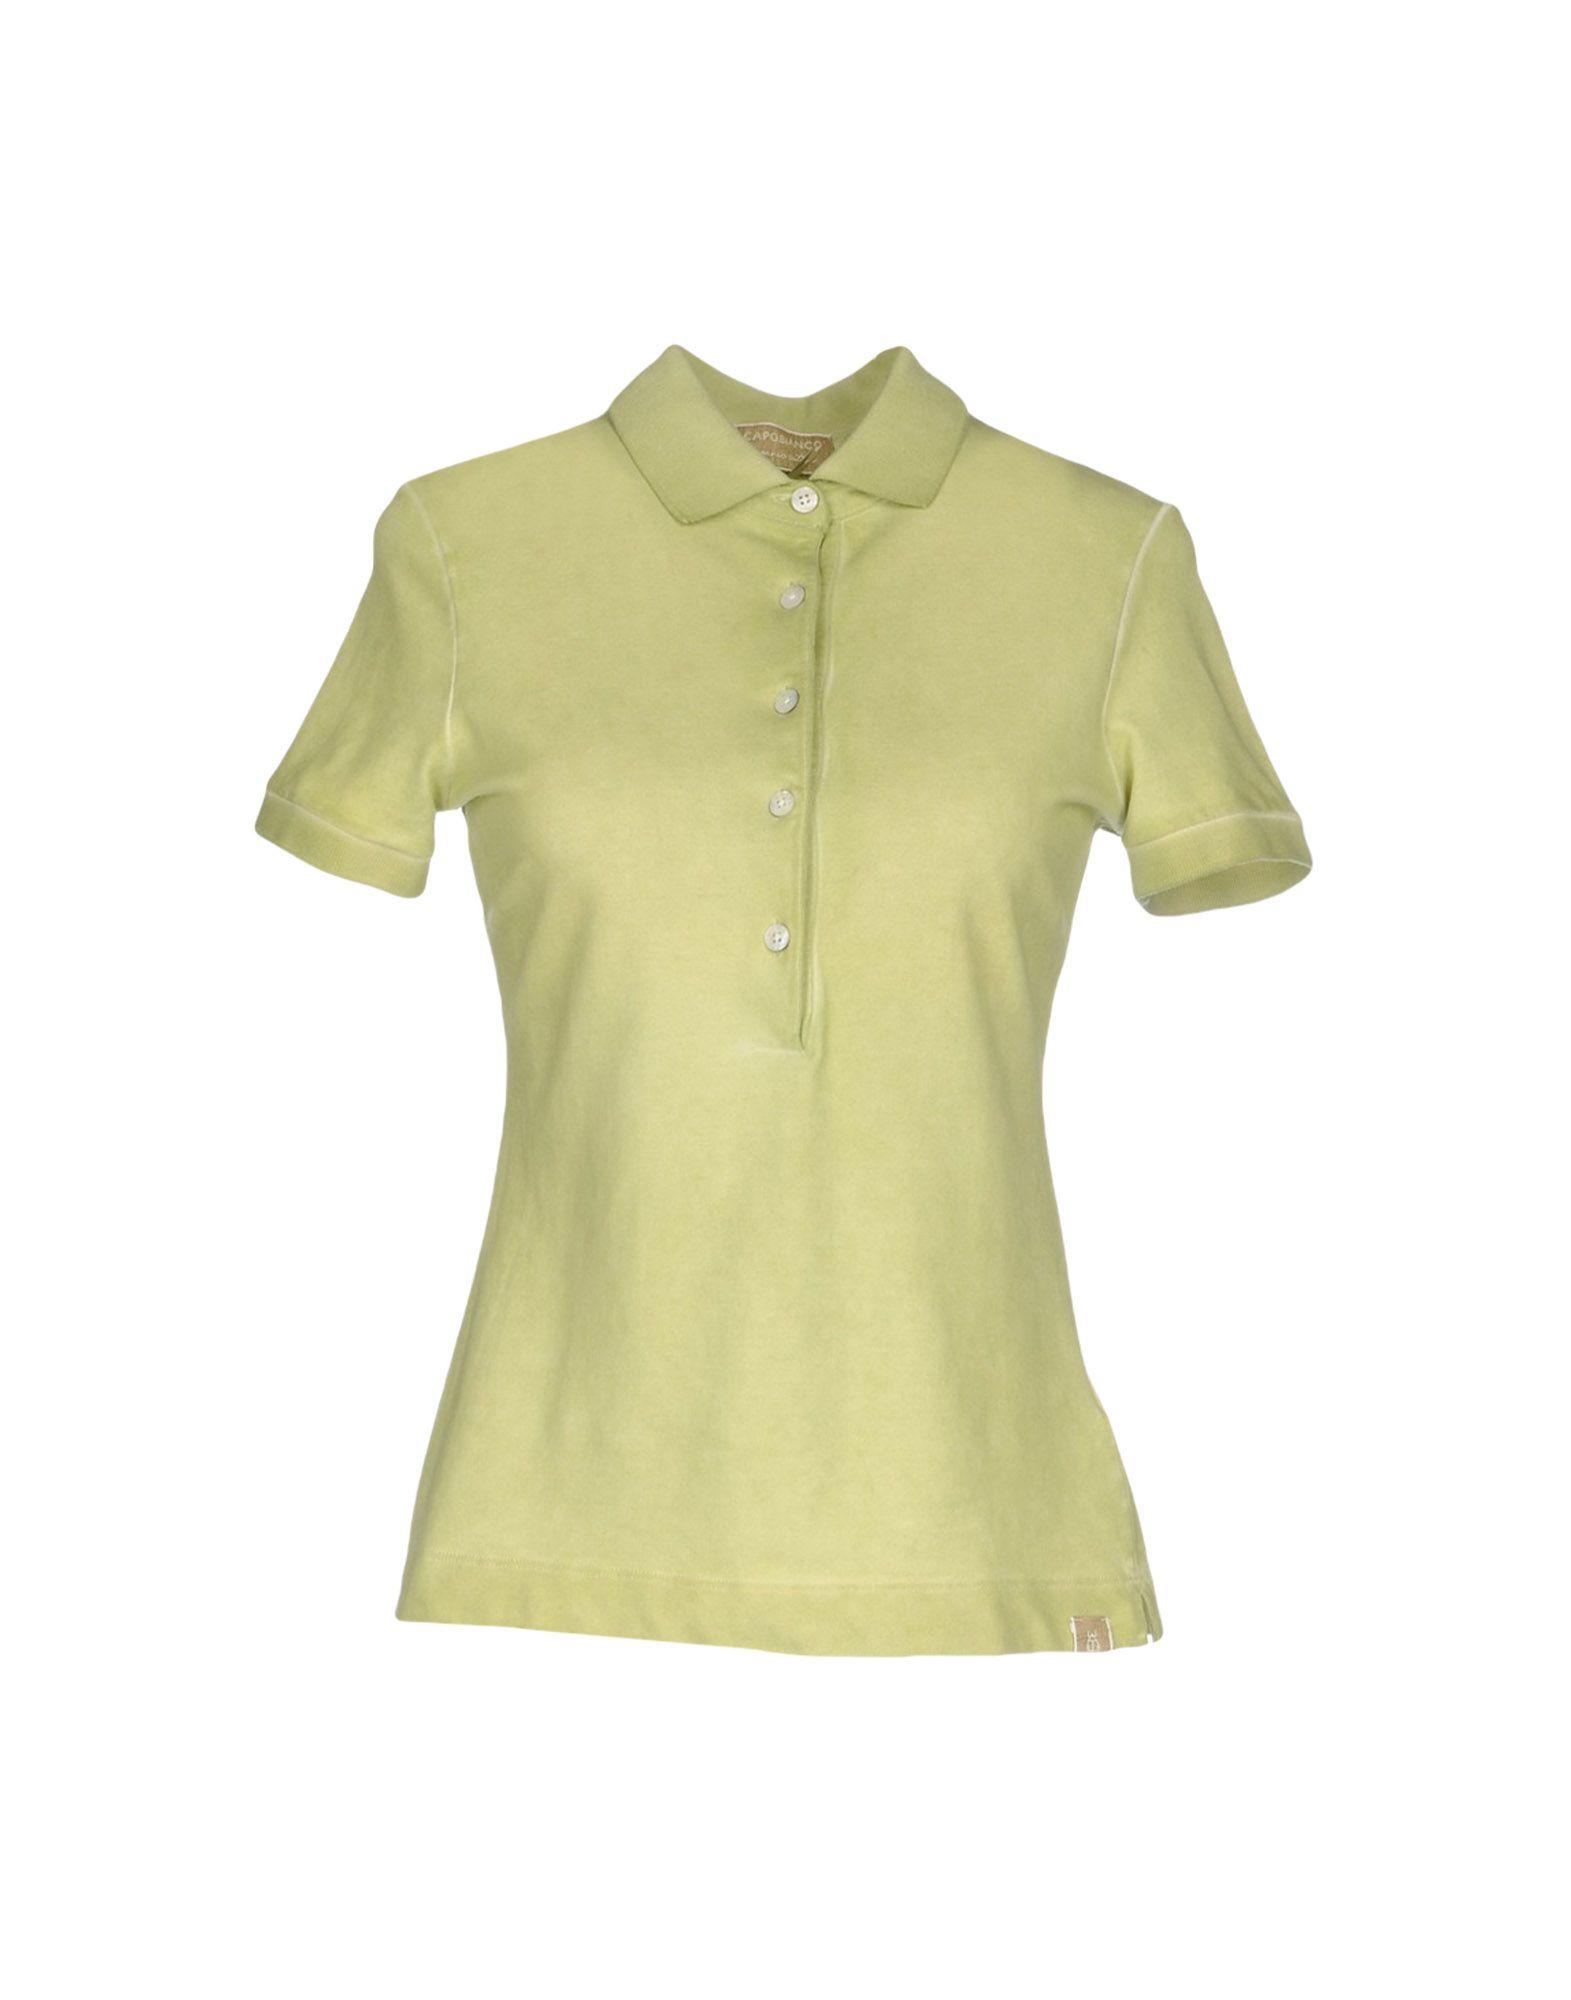 Capobianco Polo shirt